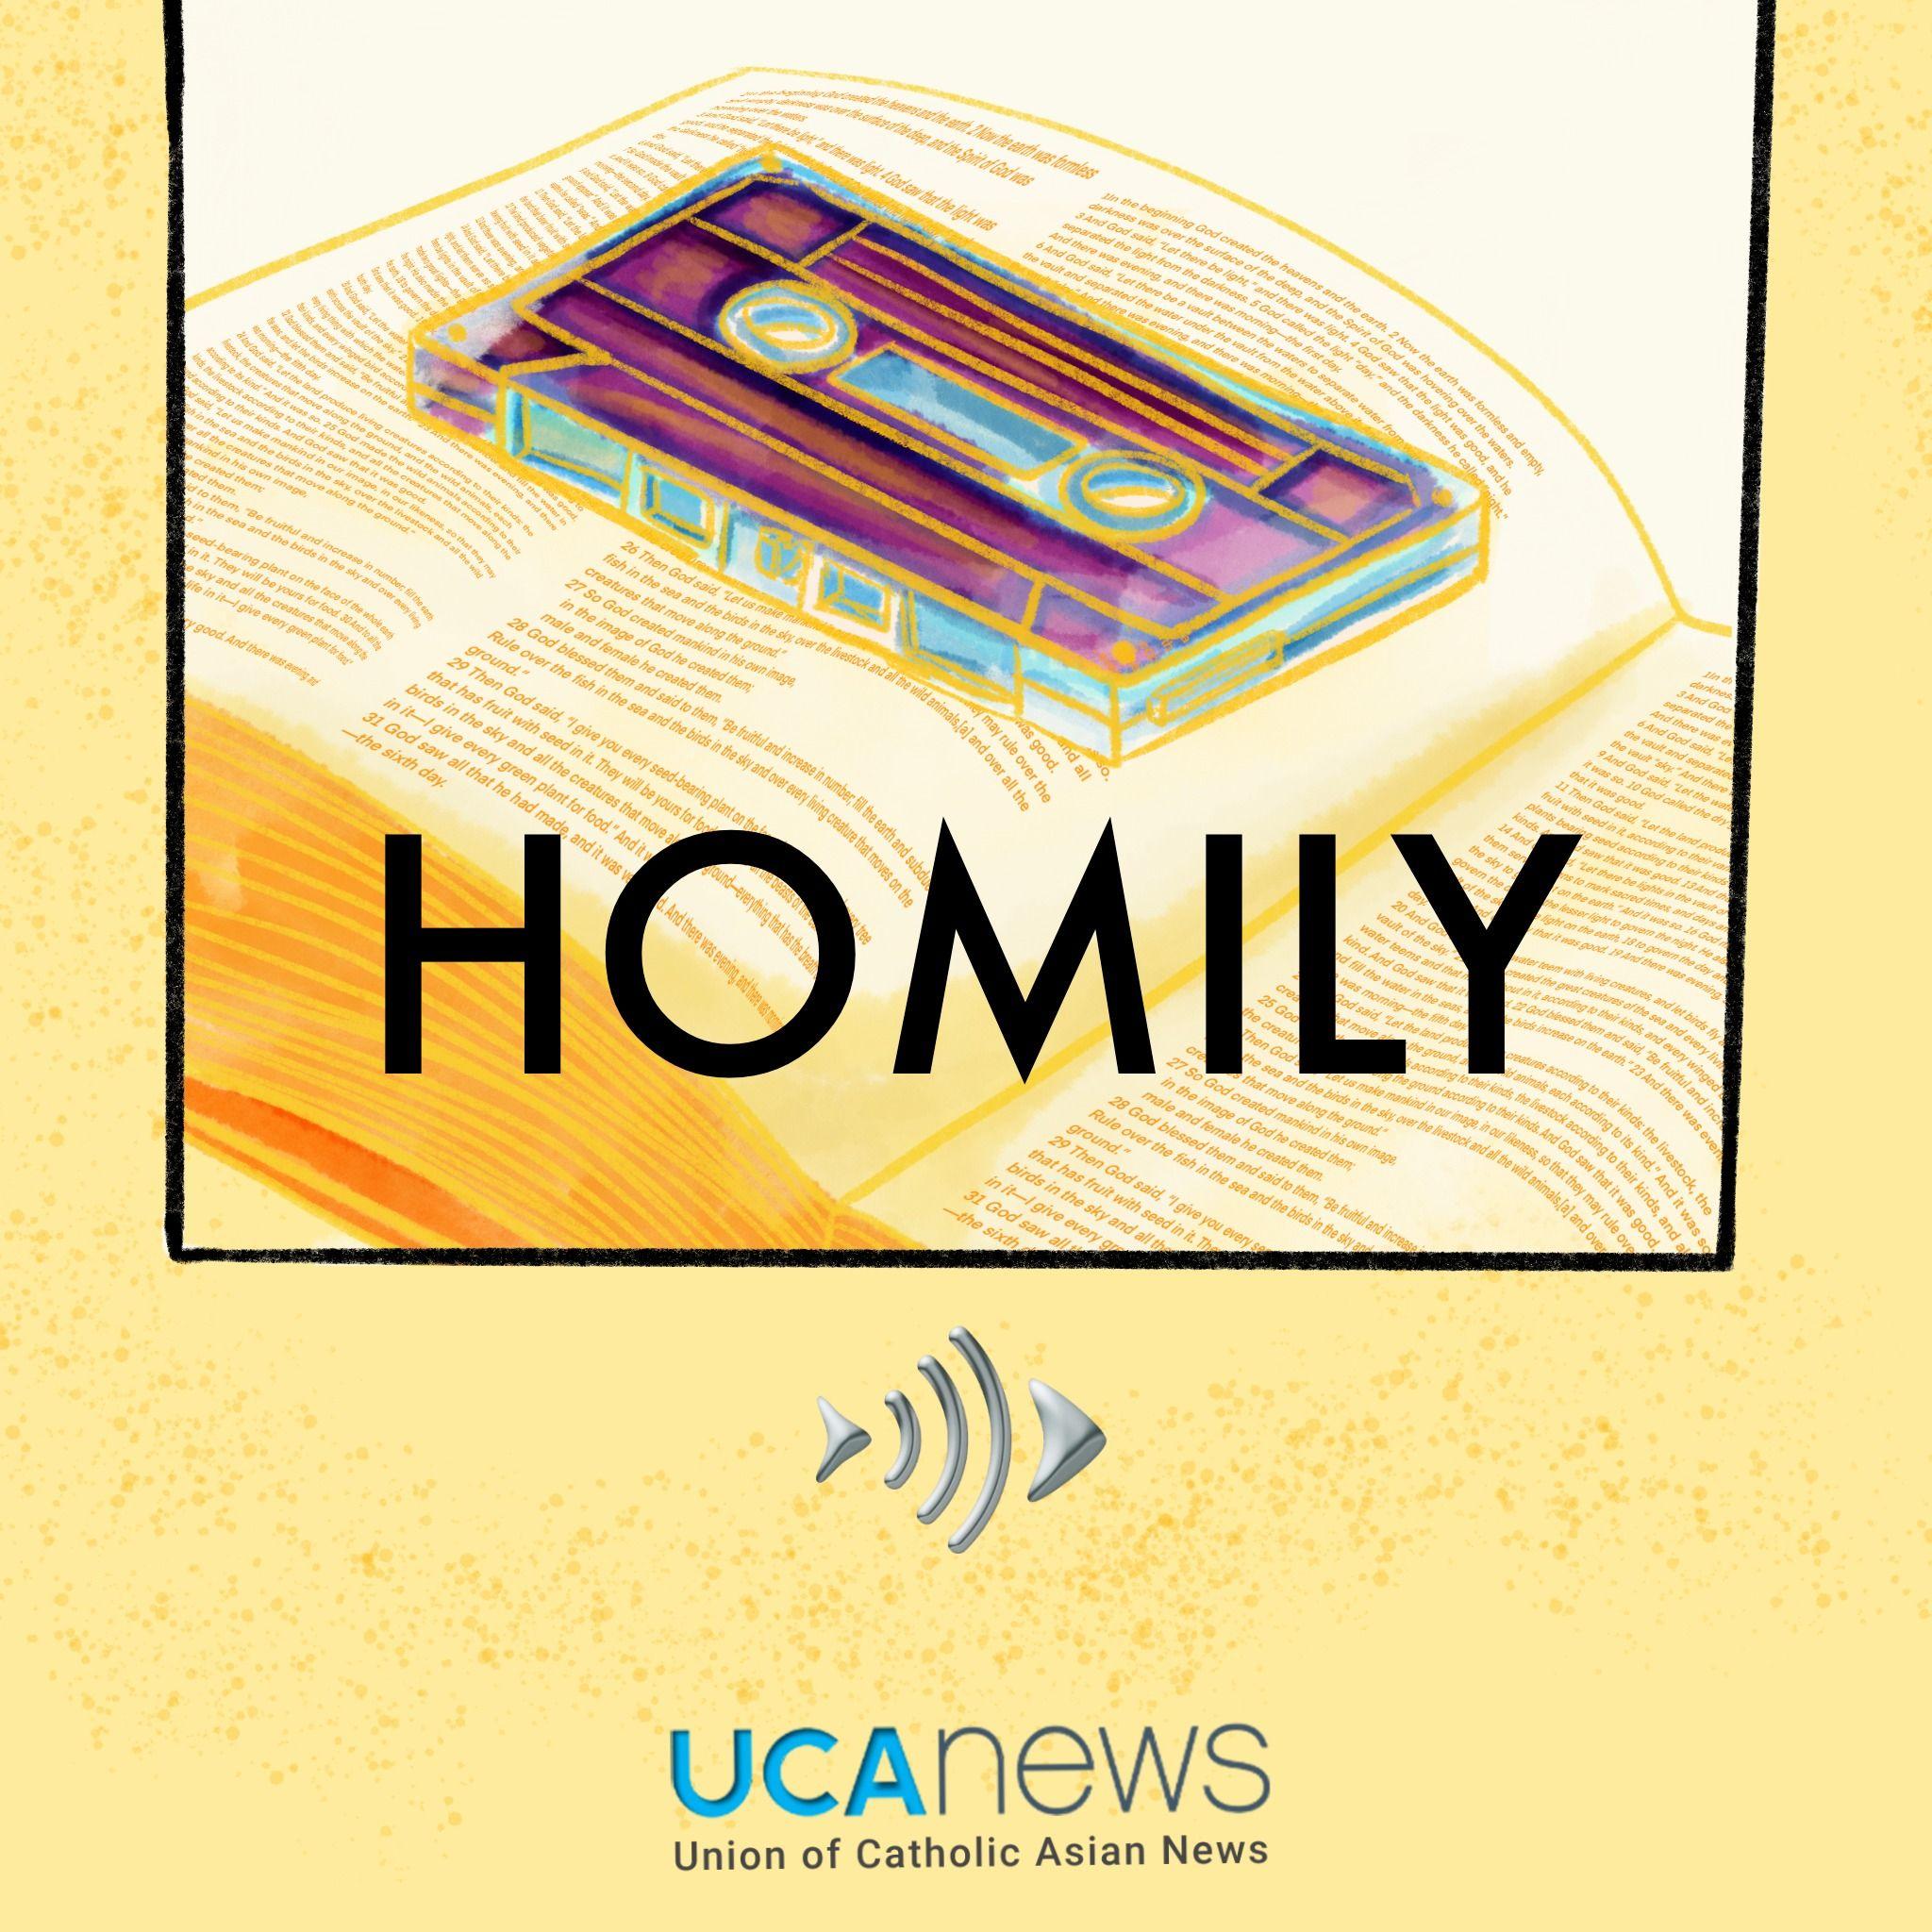 Homilies: Twenty-fourth Sunday of the Year (B) Sept 12, 2021